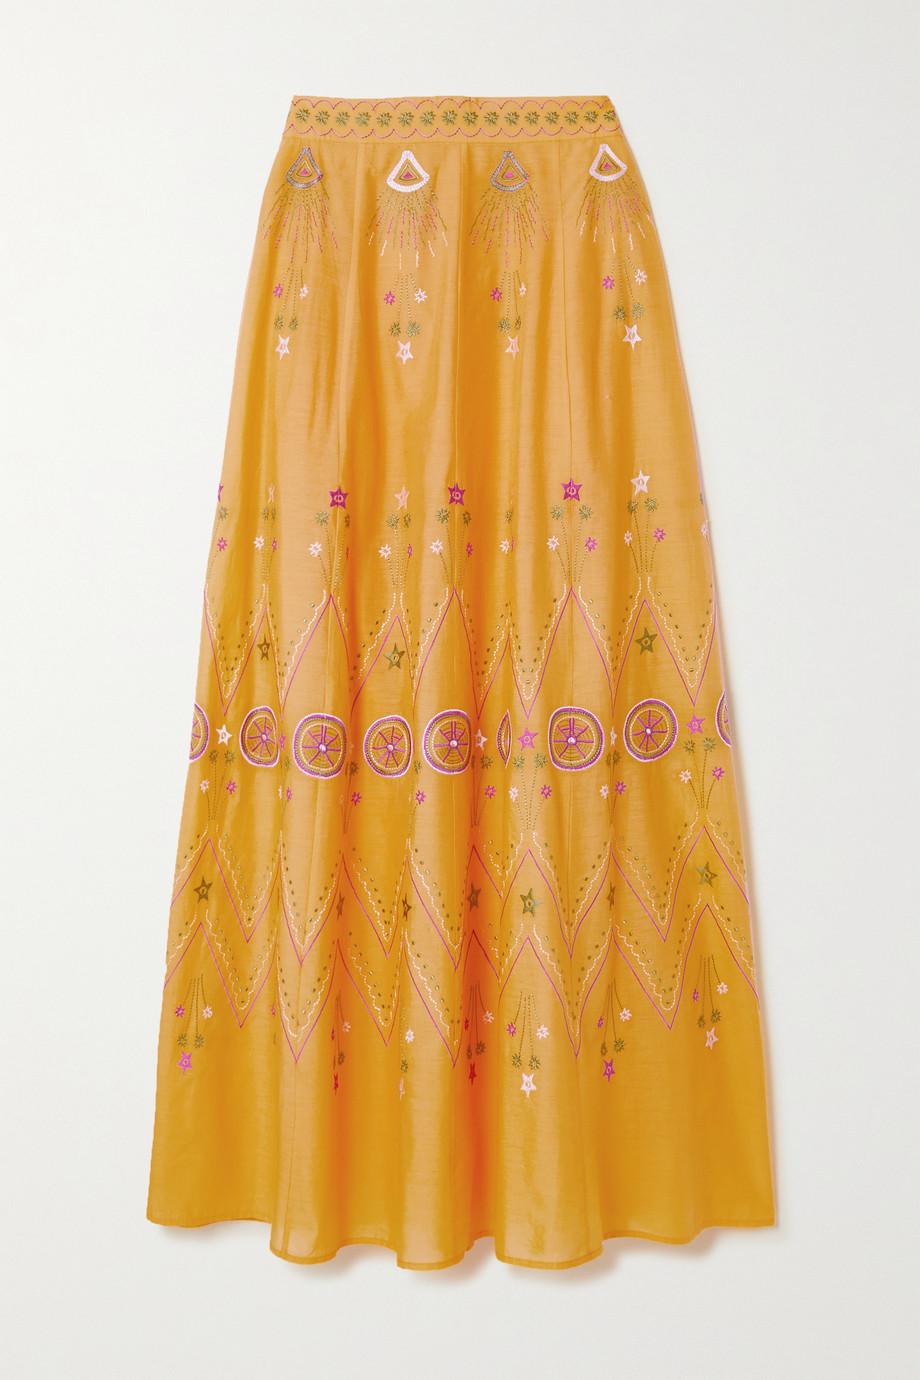 Le Sirenuse Positano Camille Stromboli embroidered cotton-voile maxi skirt